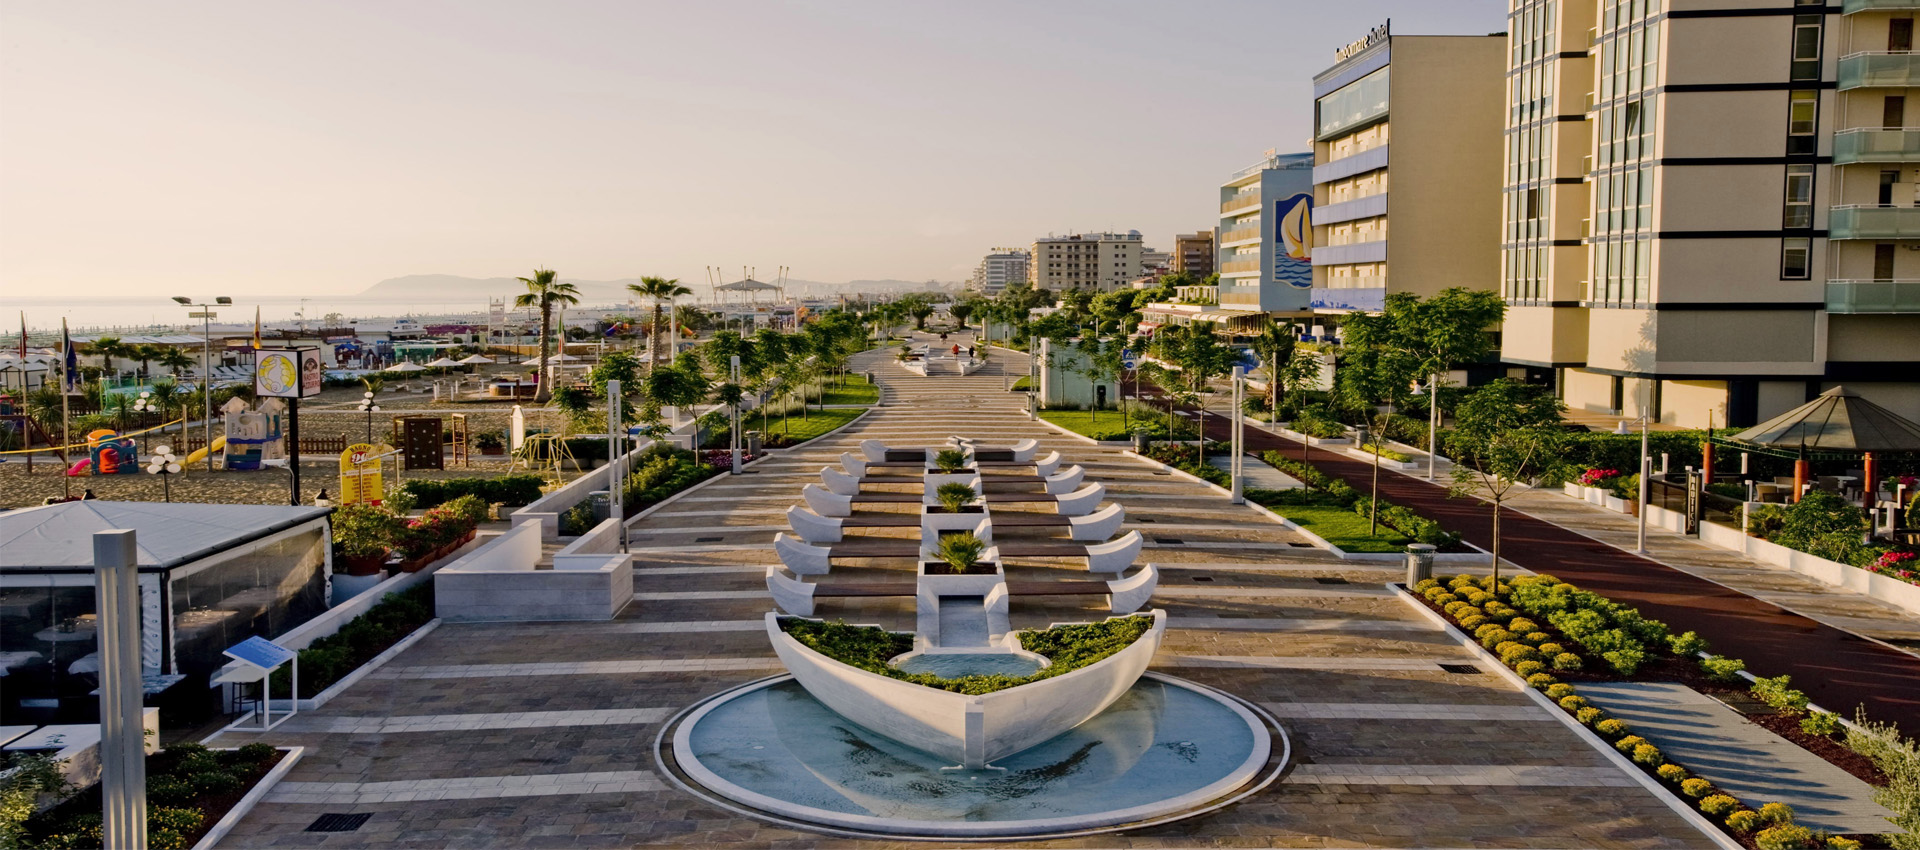 Riccione Seaside Promenade And Underground Parking